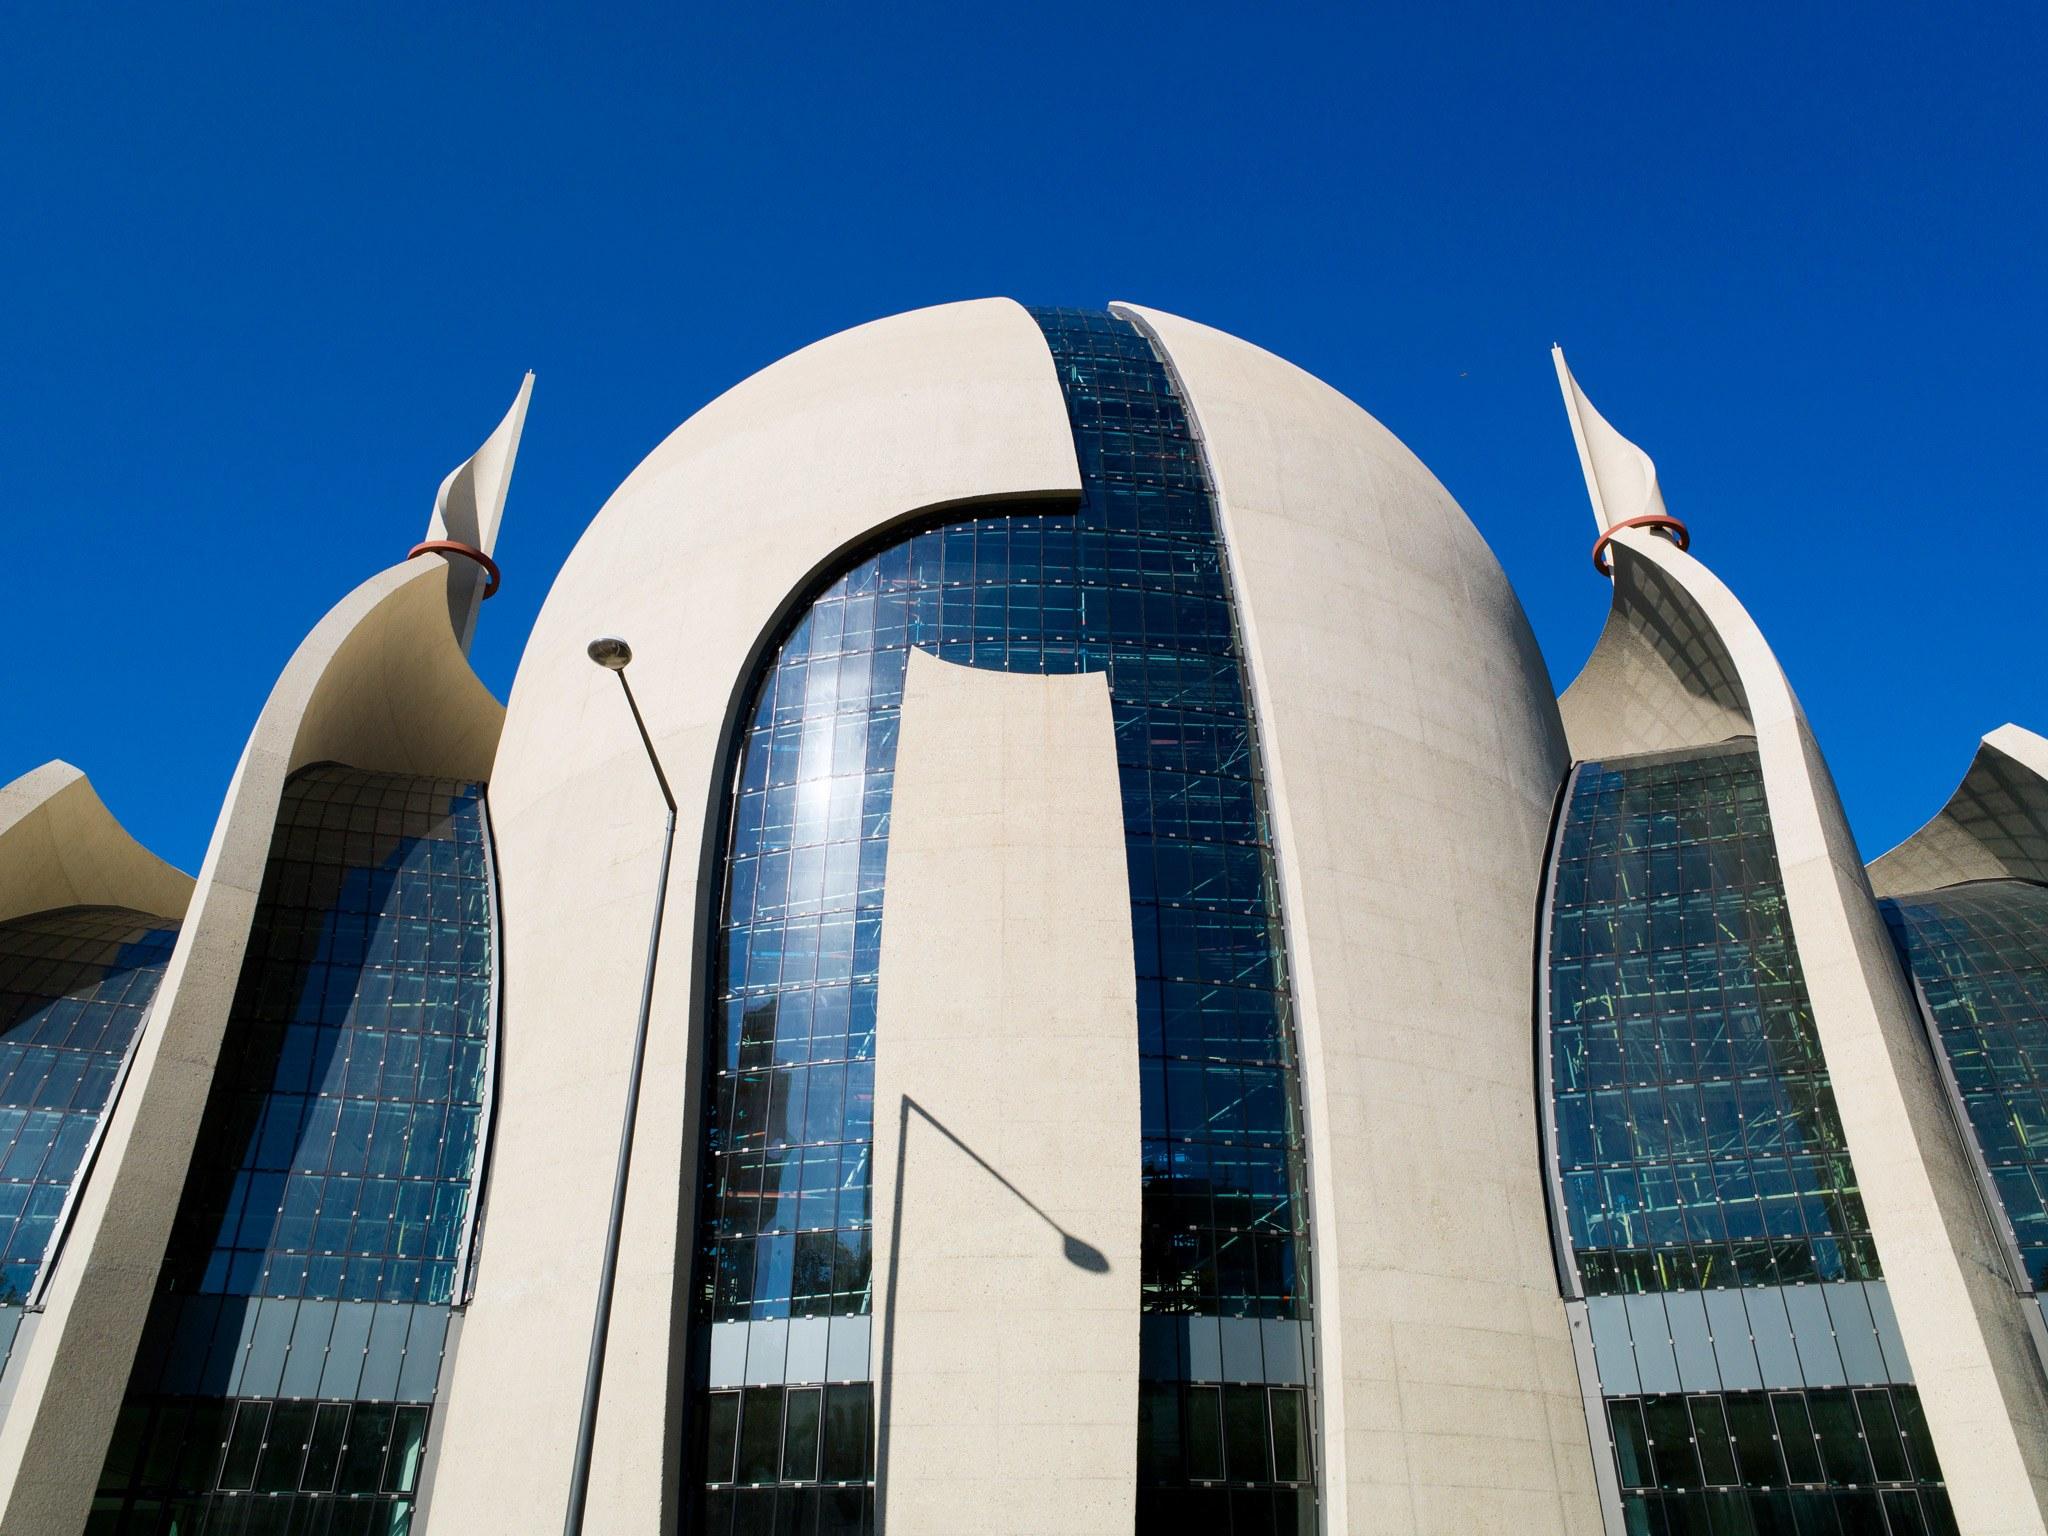 Мечети - настоящие шедевры архитектуры